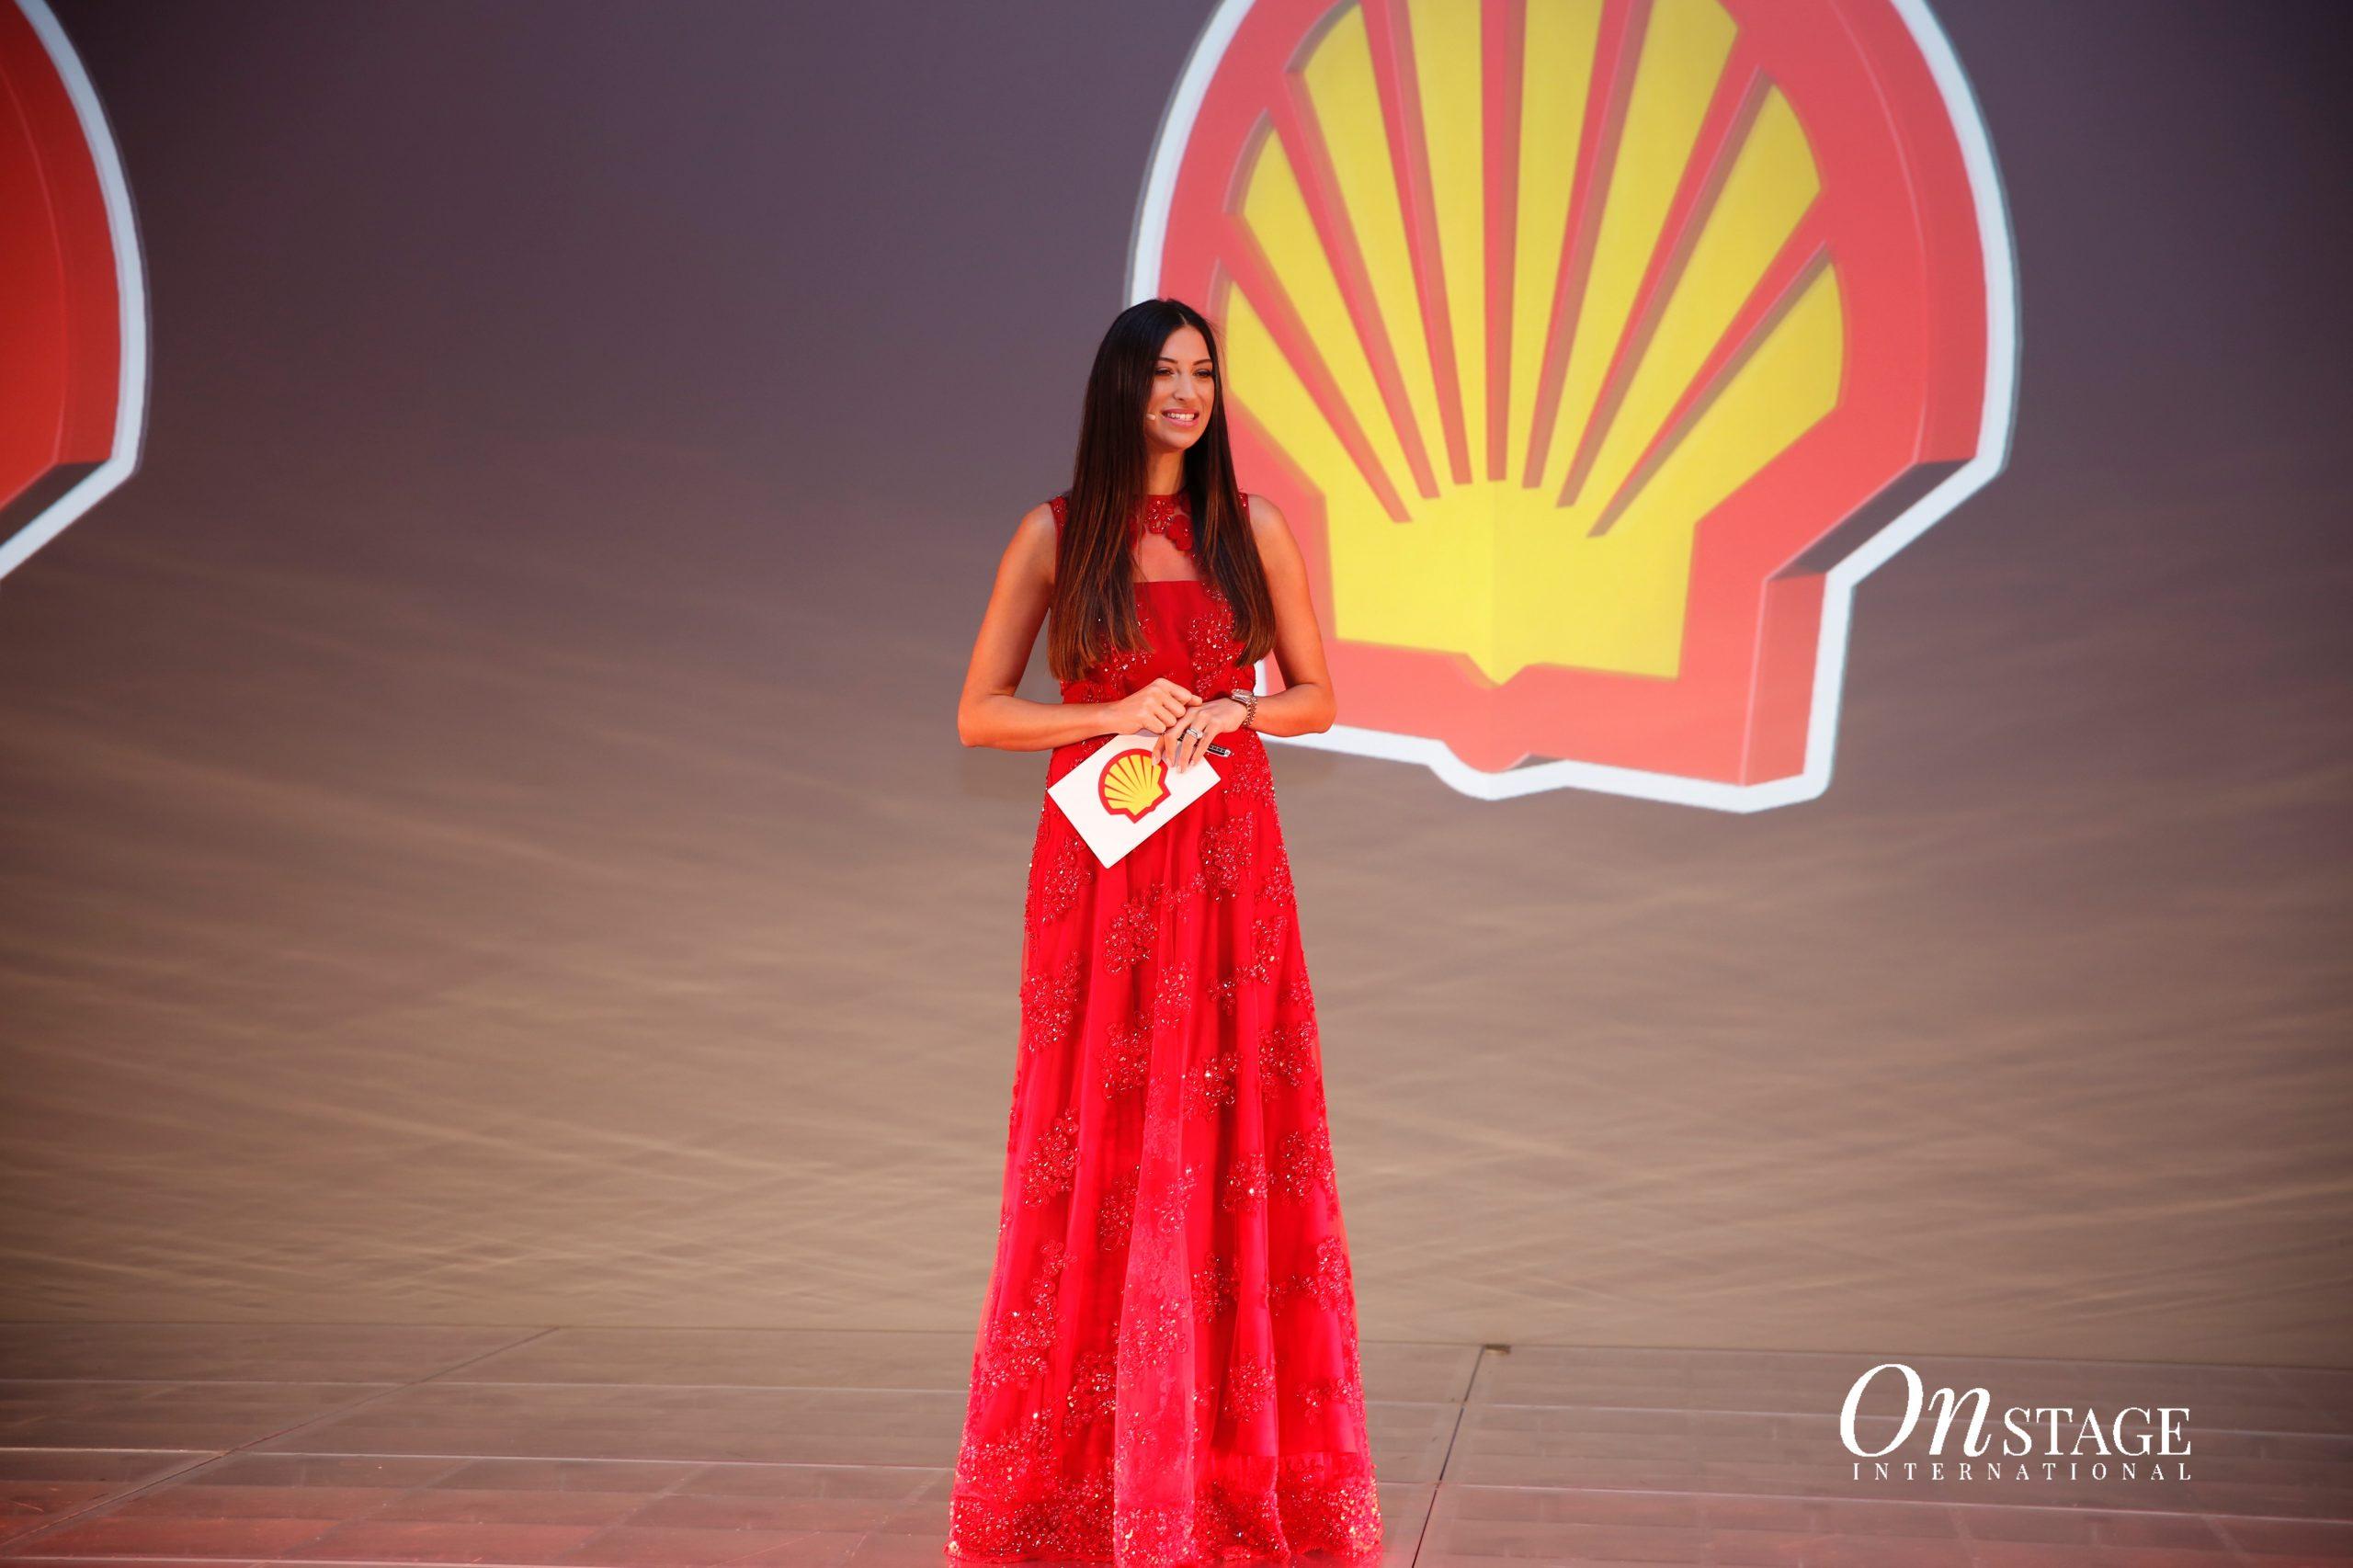 Shereen Mitwalli Hosts Iconic Shell Product Launch